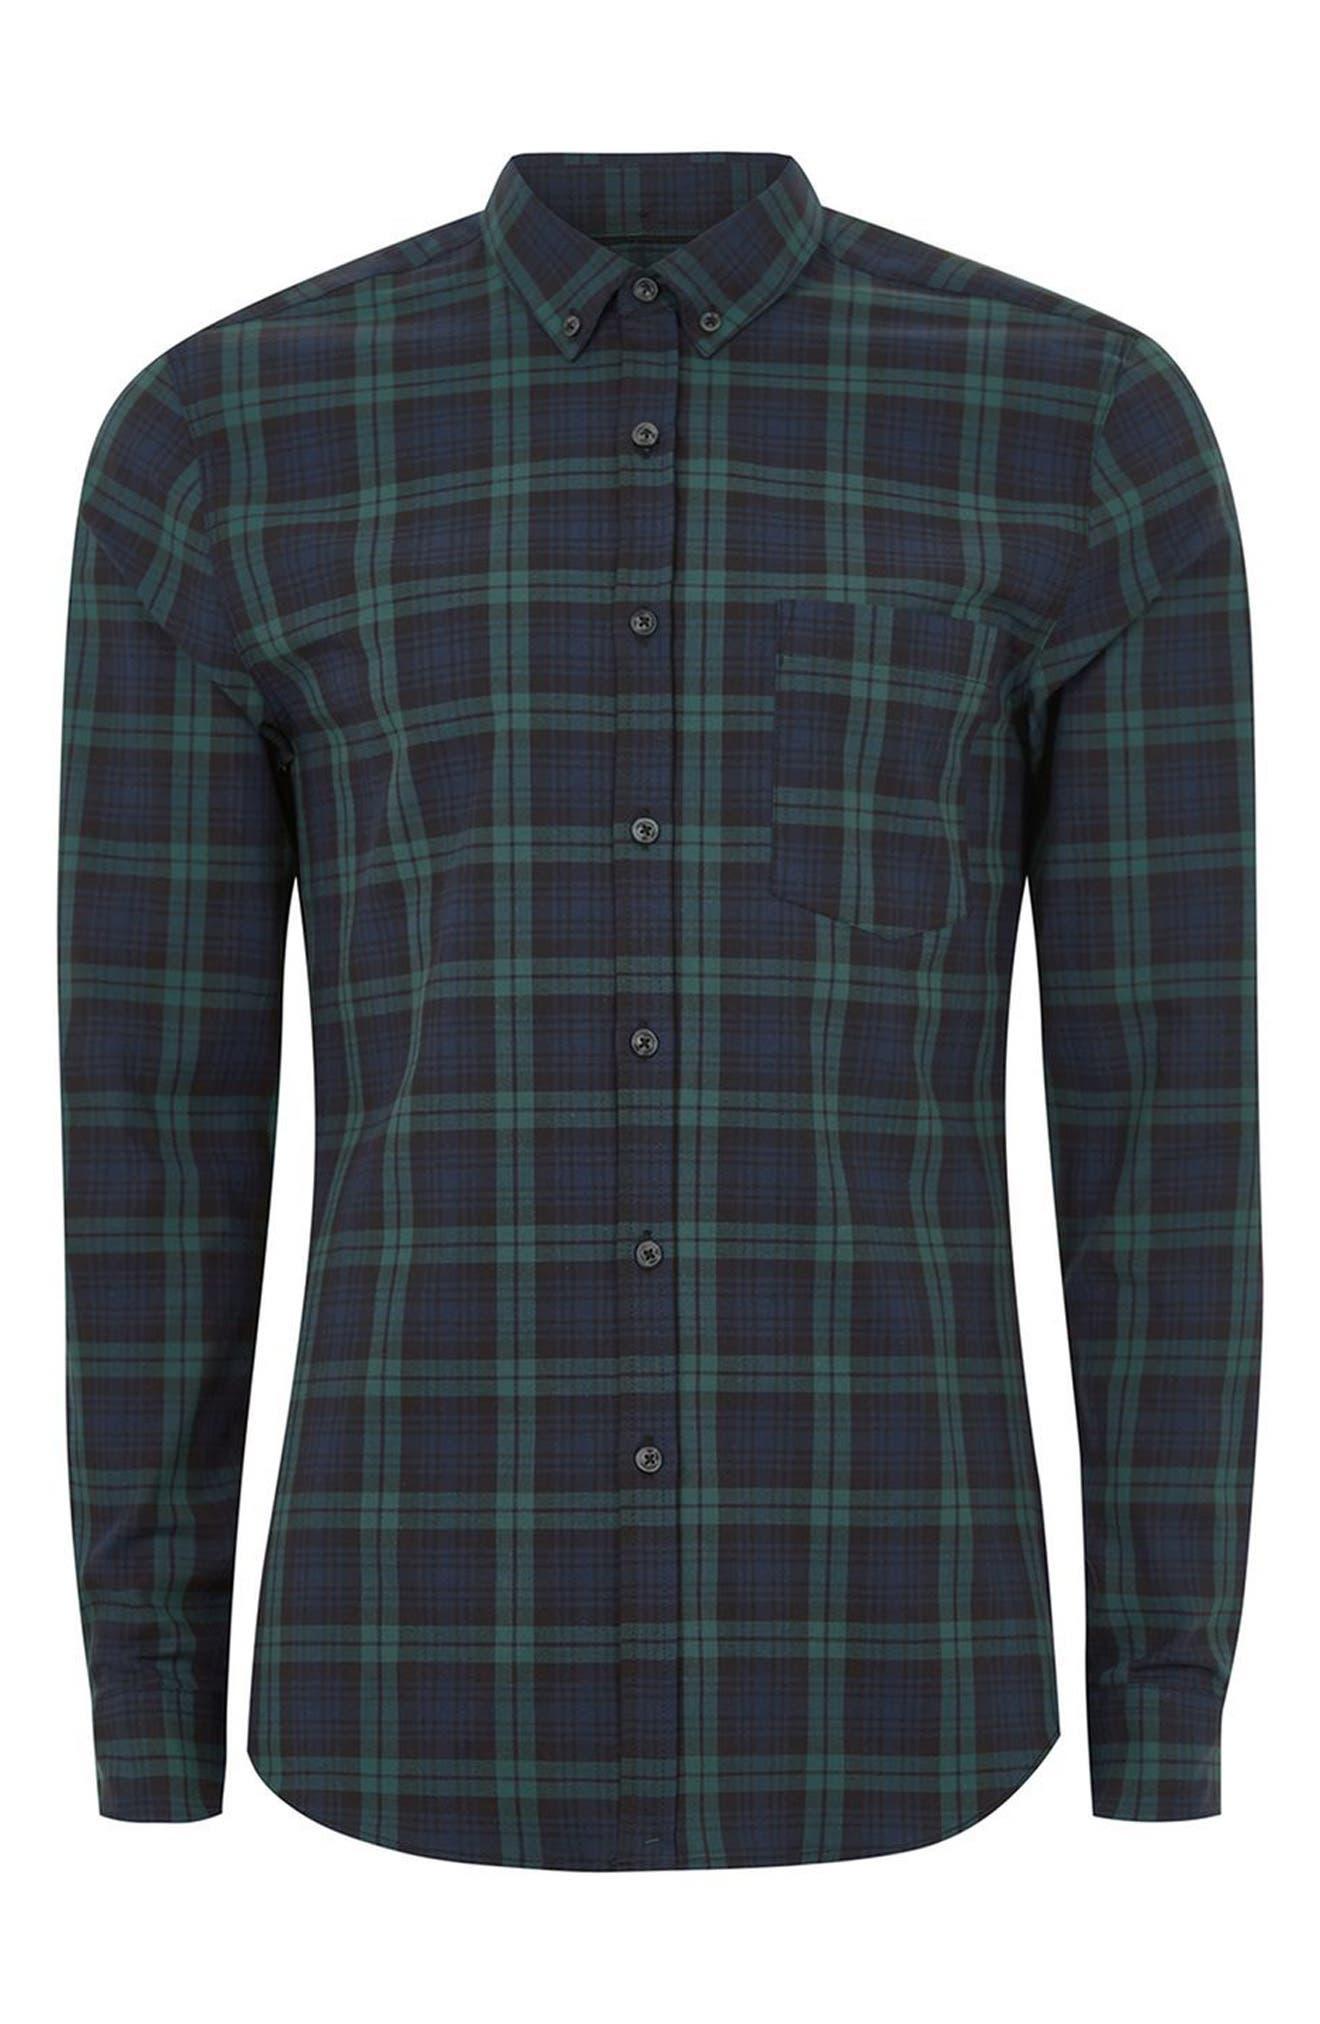 Muscle Fit Black Watch Plaid Shirt,                             Alternate thumbnail 4, color,                             Green Multi